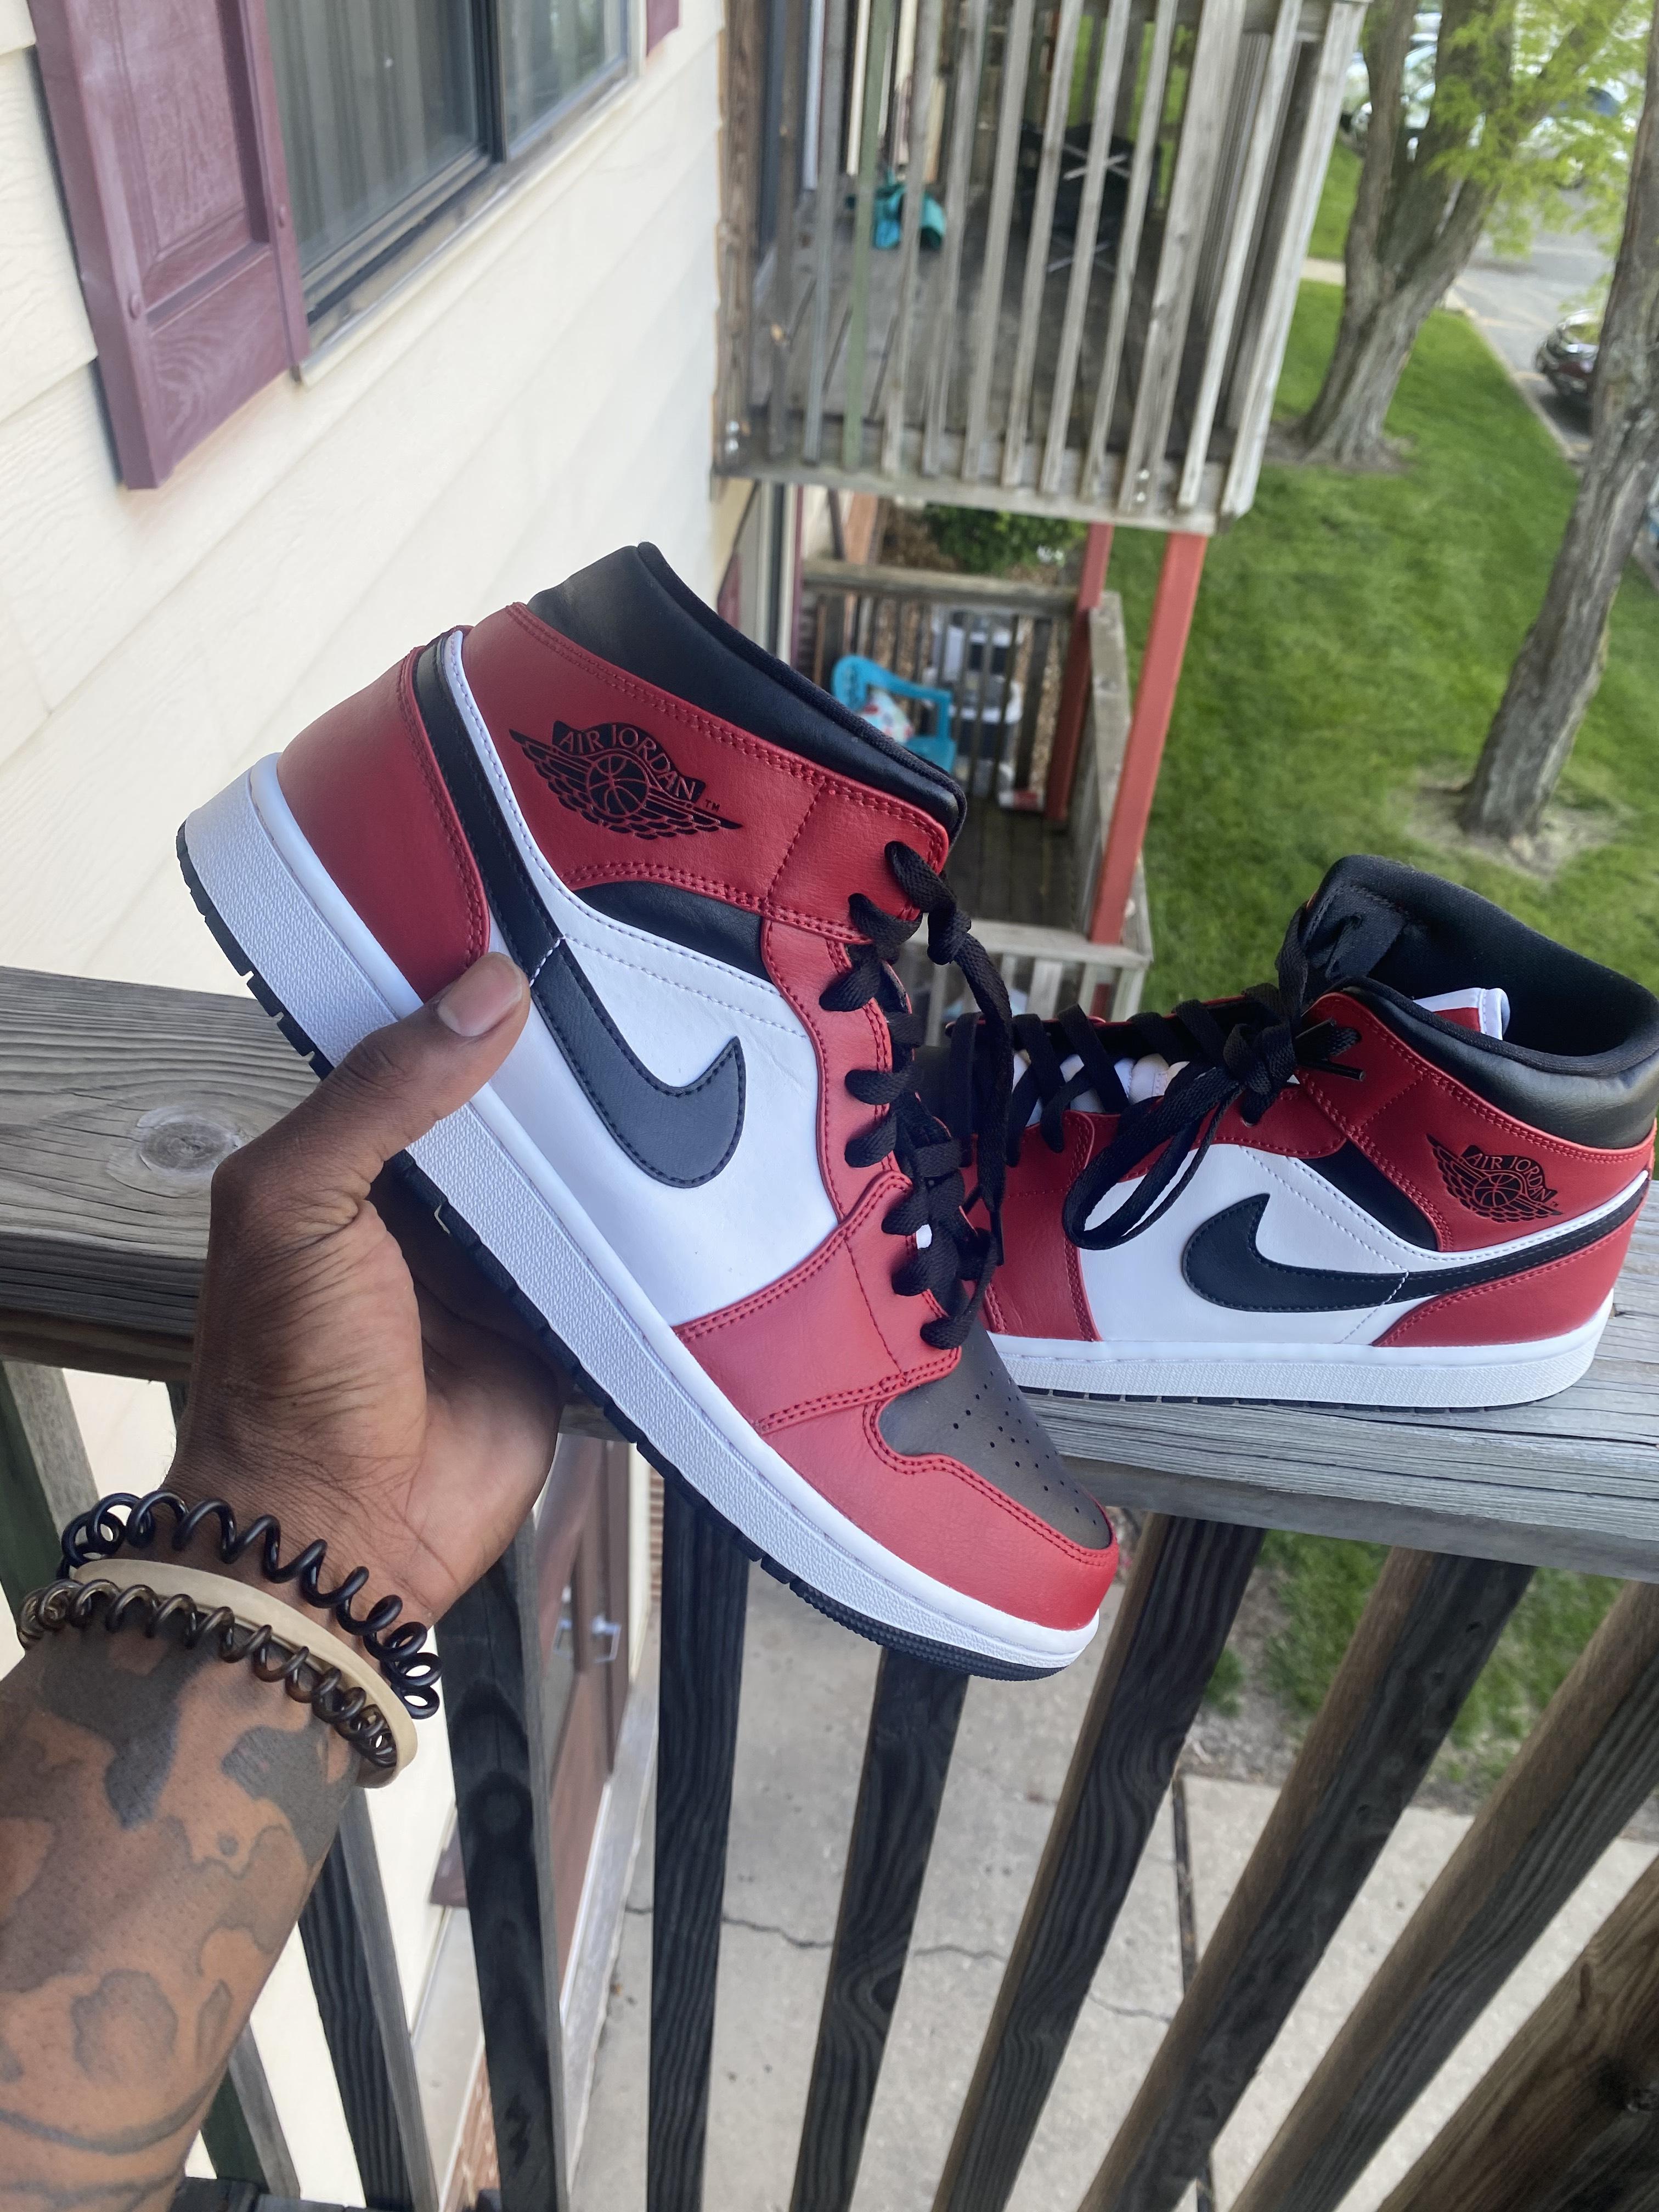 Air Jordan - $220 - Size 11.5